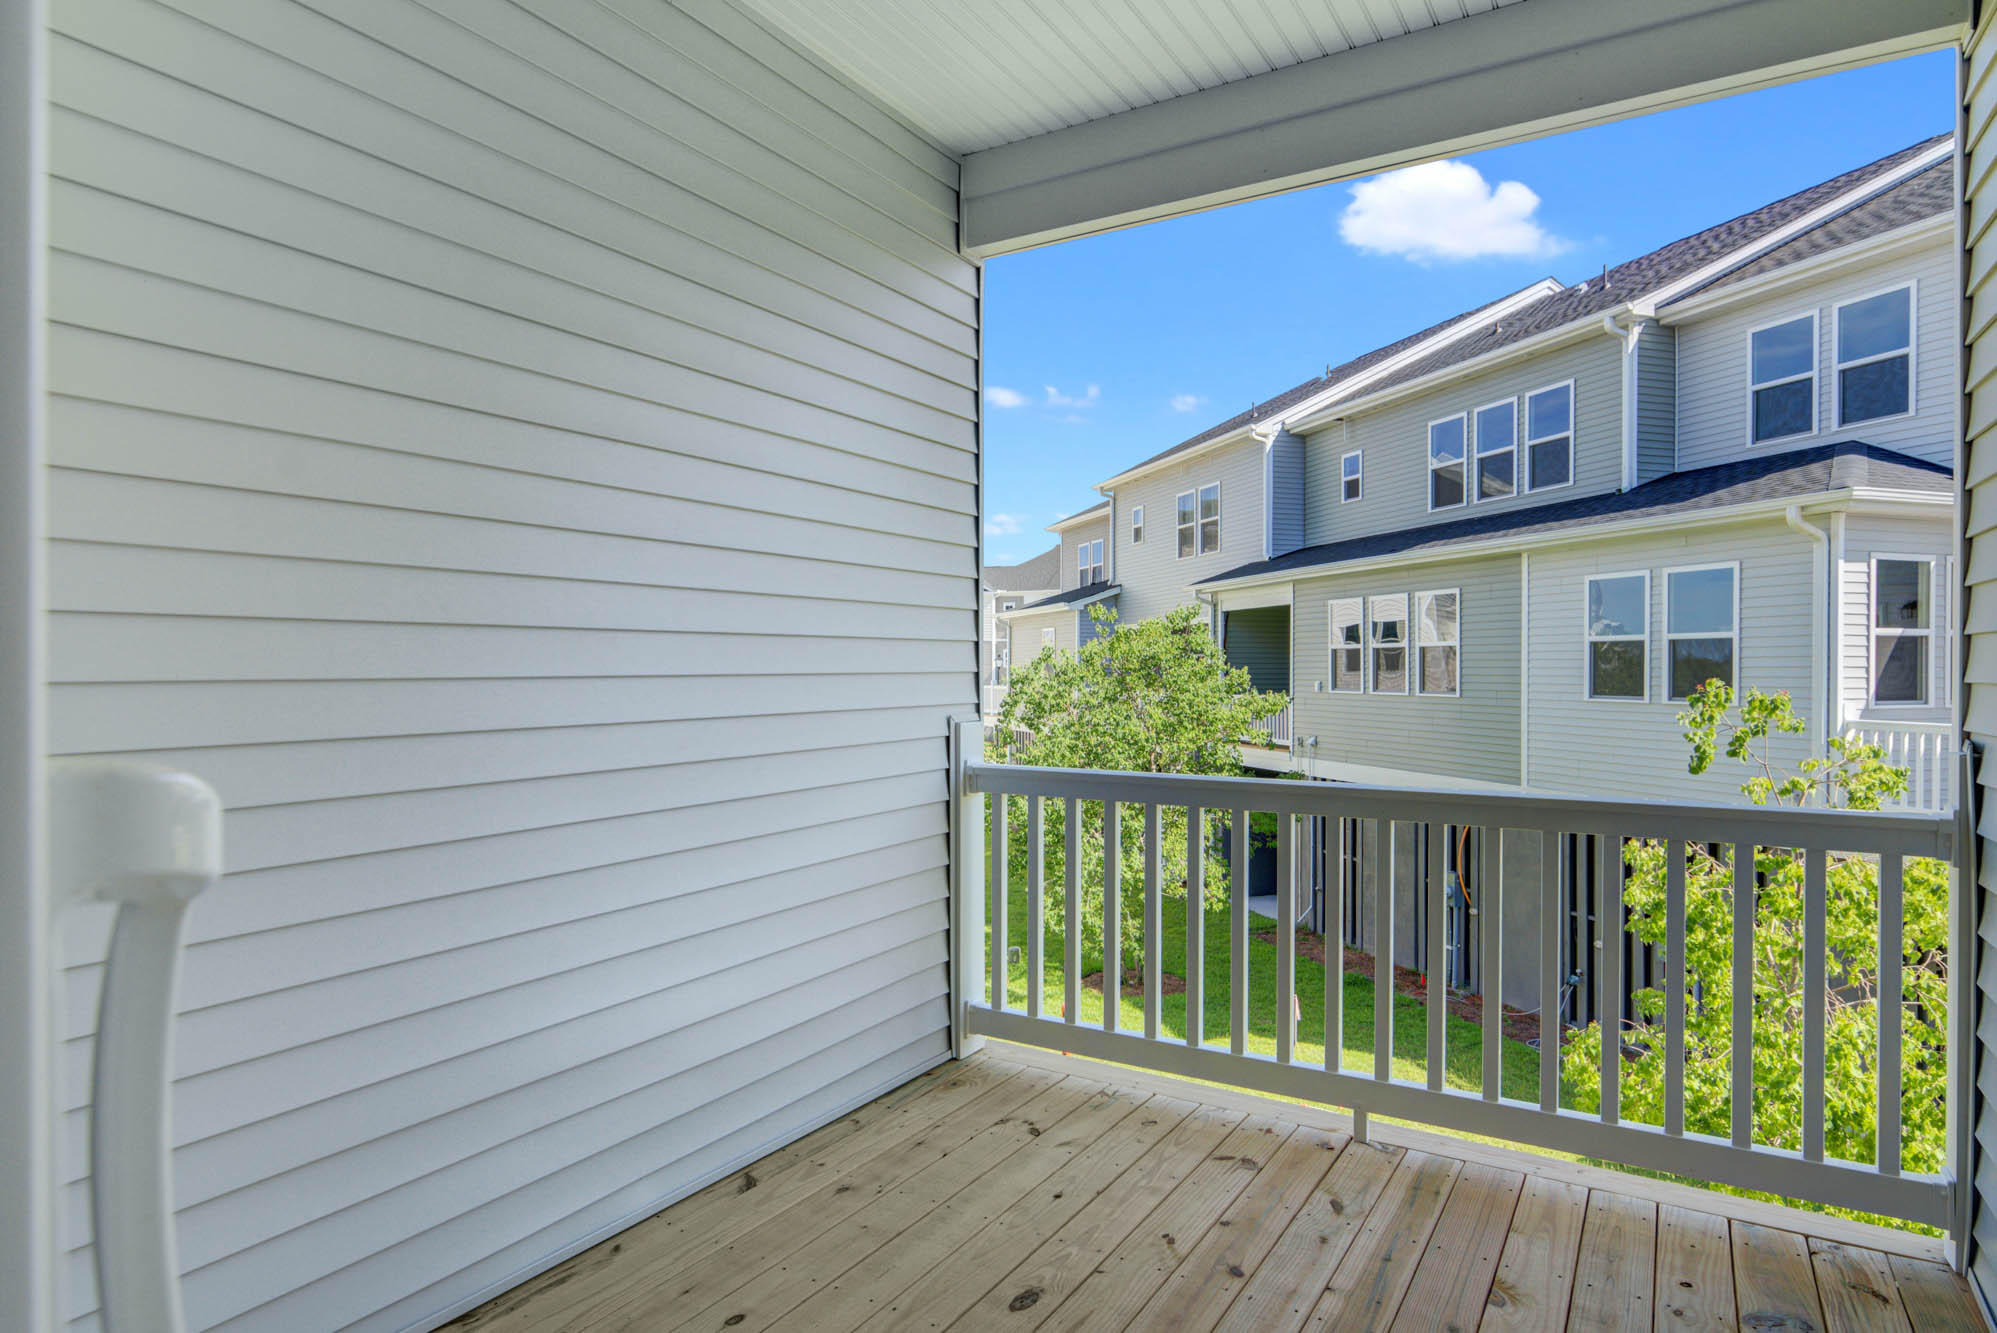 Marshview Commons Homes For Sale - 530 Mclernon, Johns Island, SC - 9